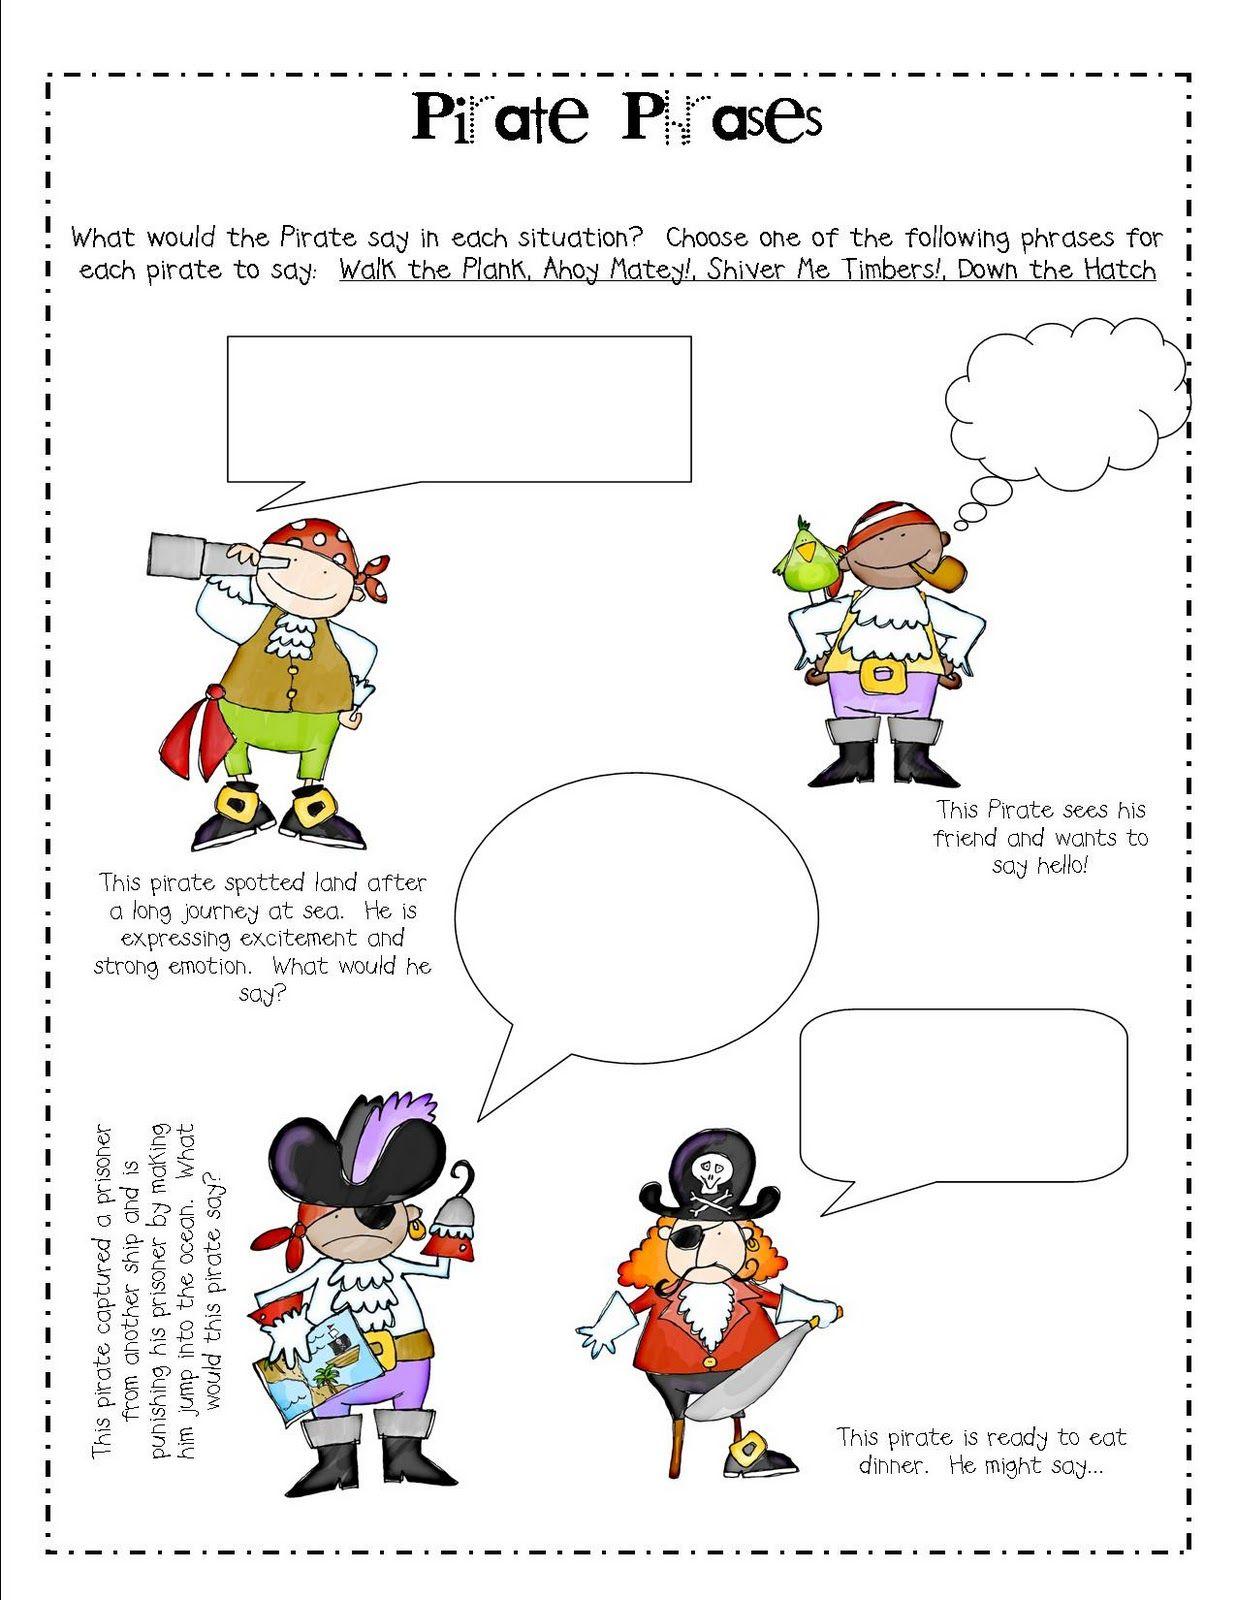 Worksheets Pirate Worksheets pirate worksheets for kindergarten justreed ashley projecte ashley